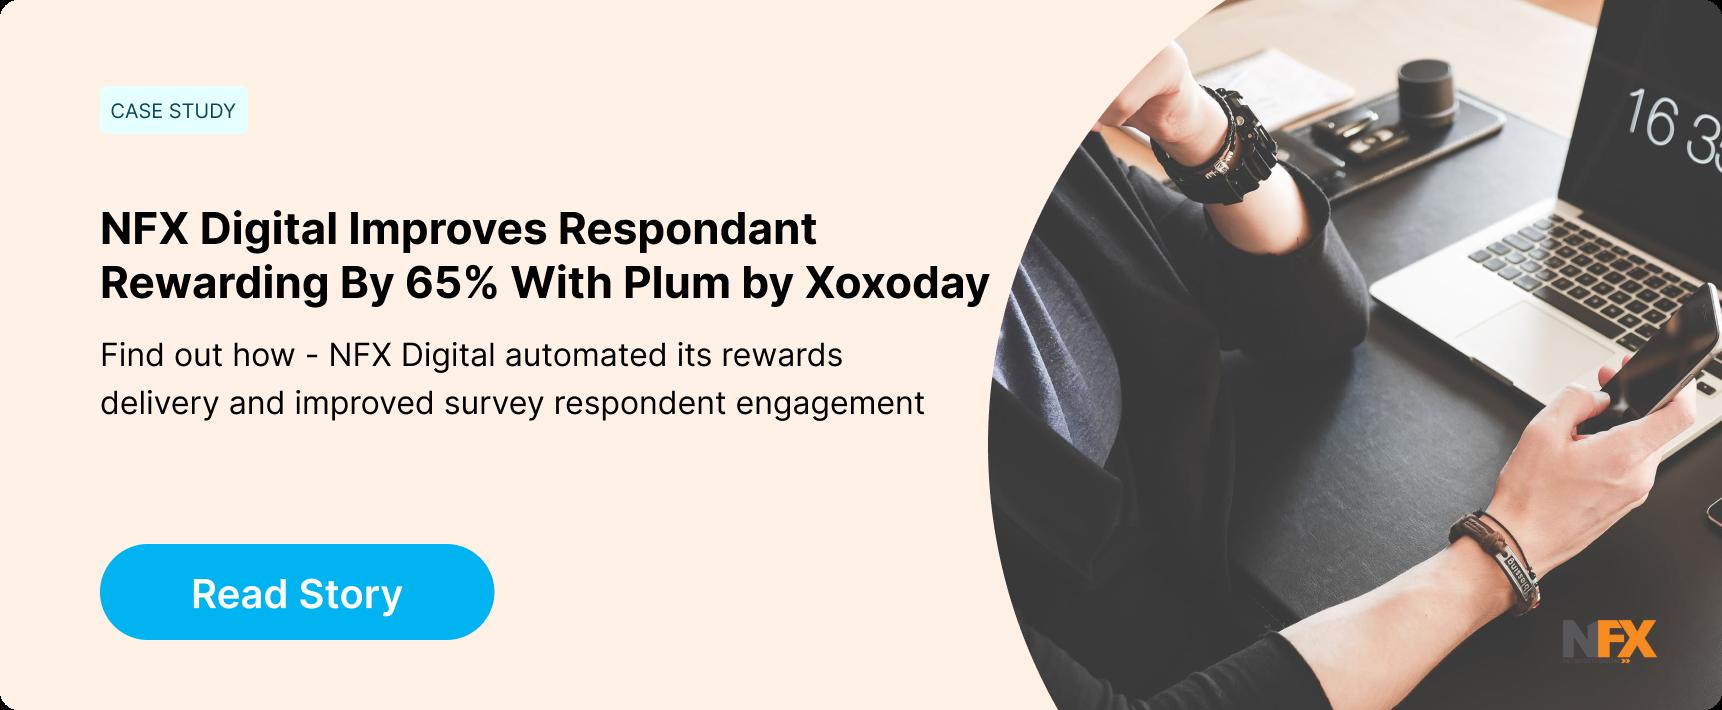 Respondant Rewarding